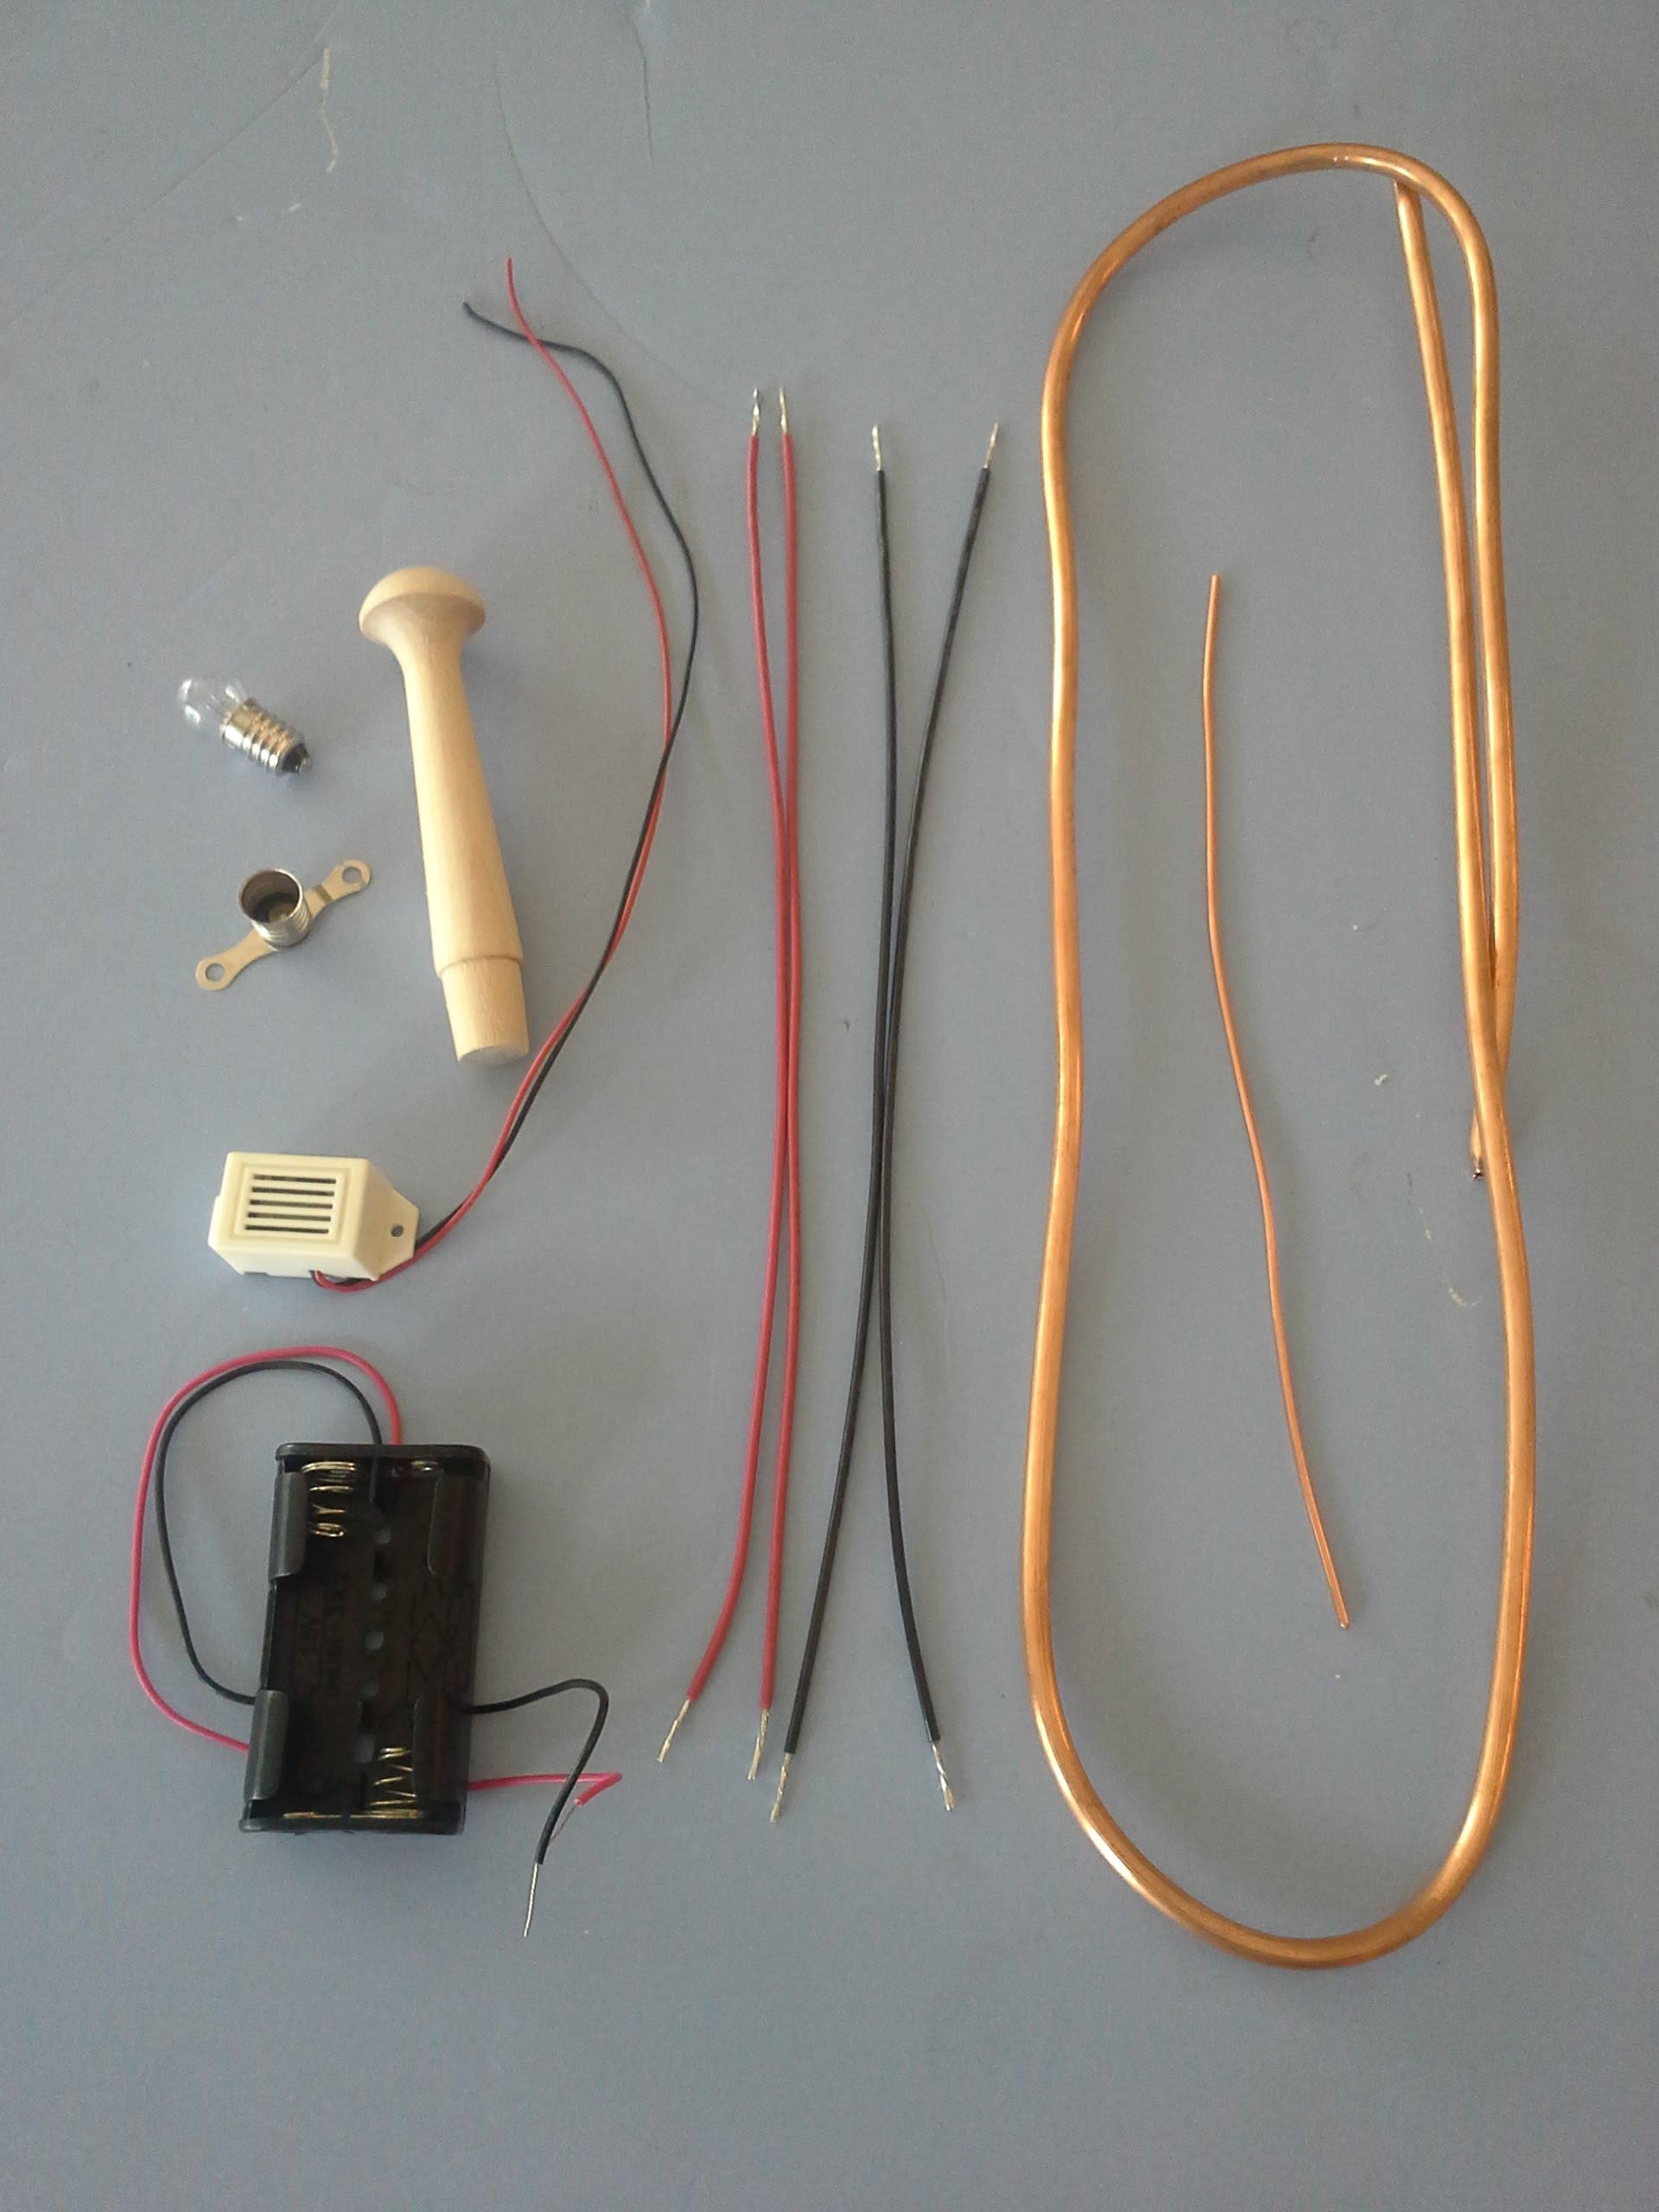 buzz wire 1?height=400&width=300 buzz wire Cat 279C Wiring-Diagram Door Closure at gsmx.co